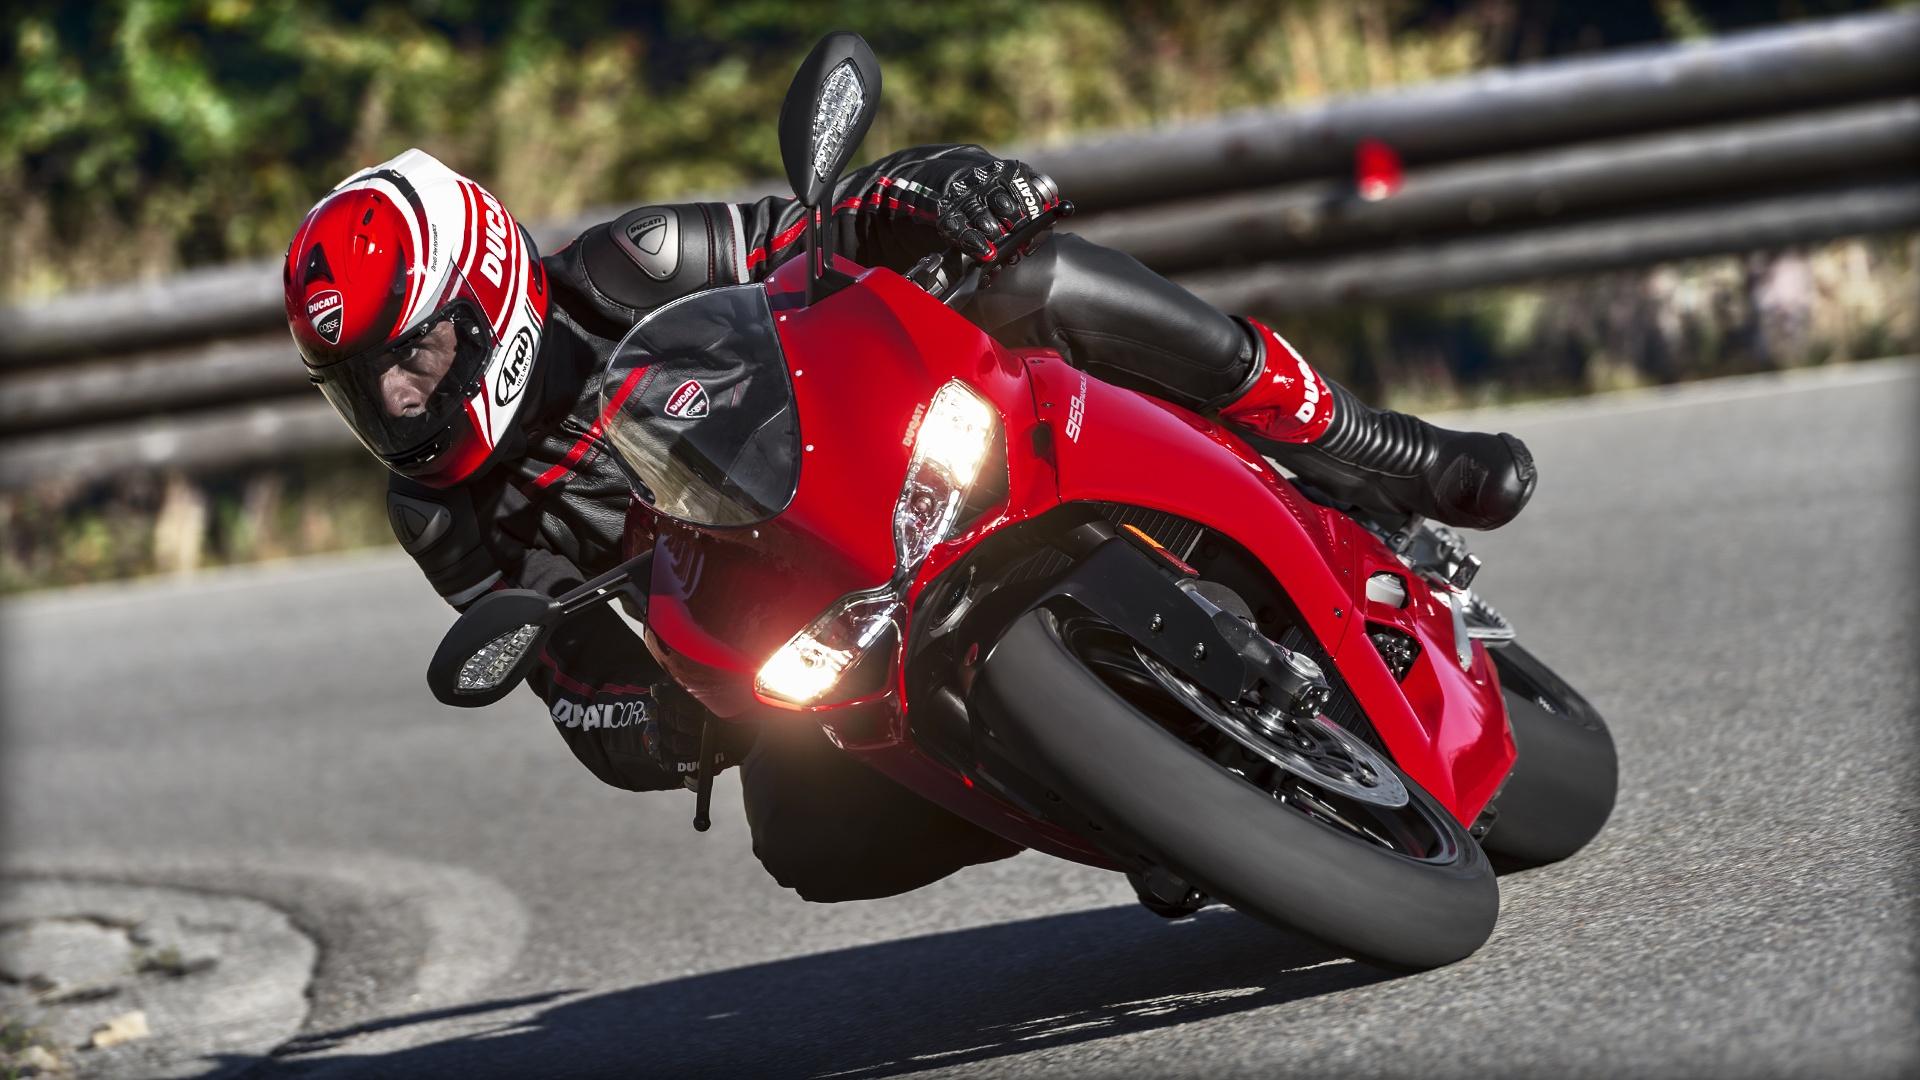 2014-Ducati-Panigale-899-1